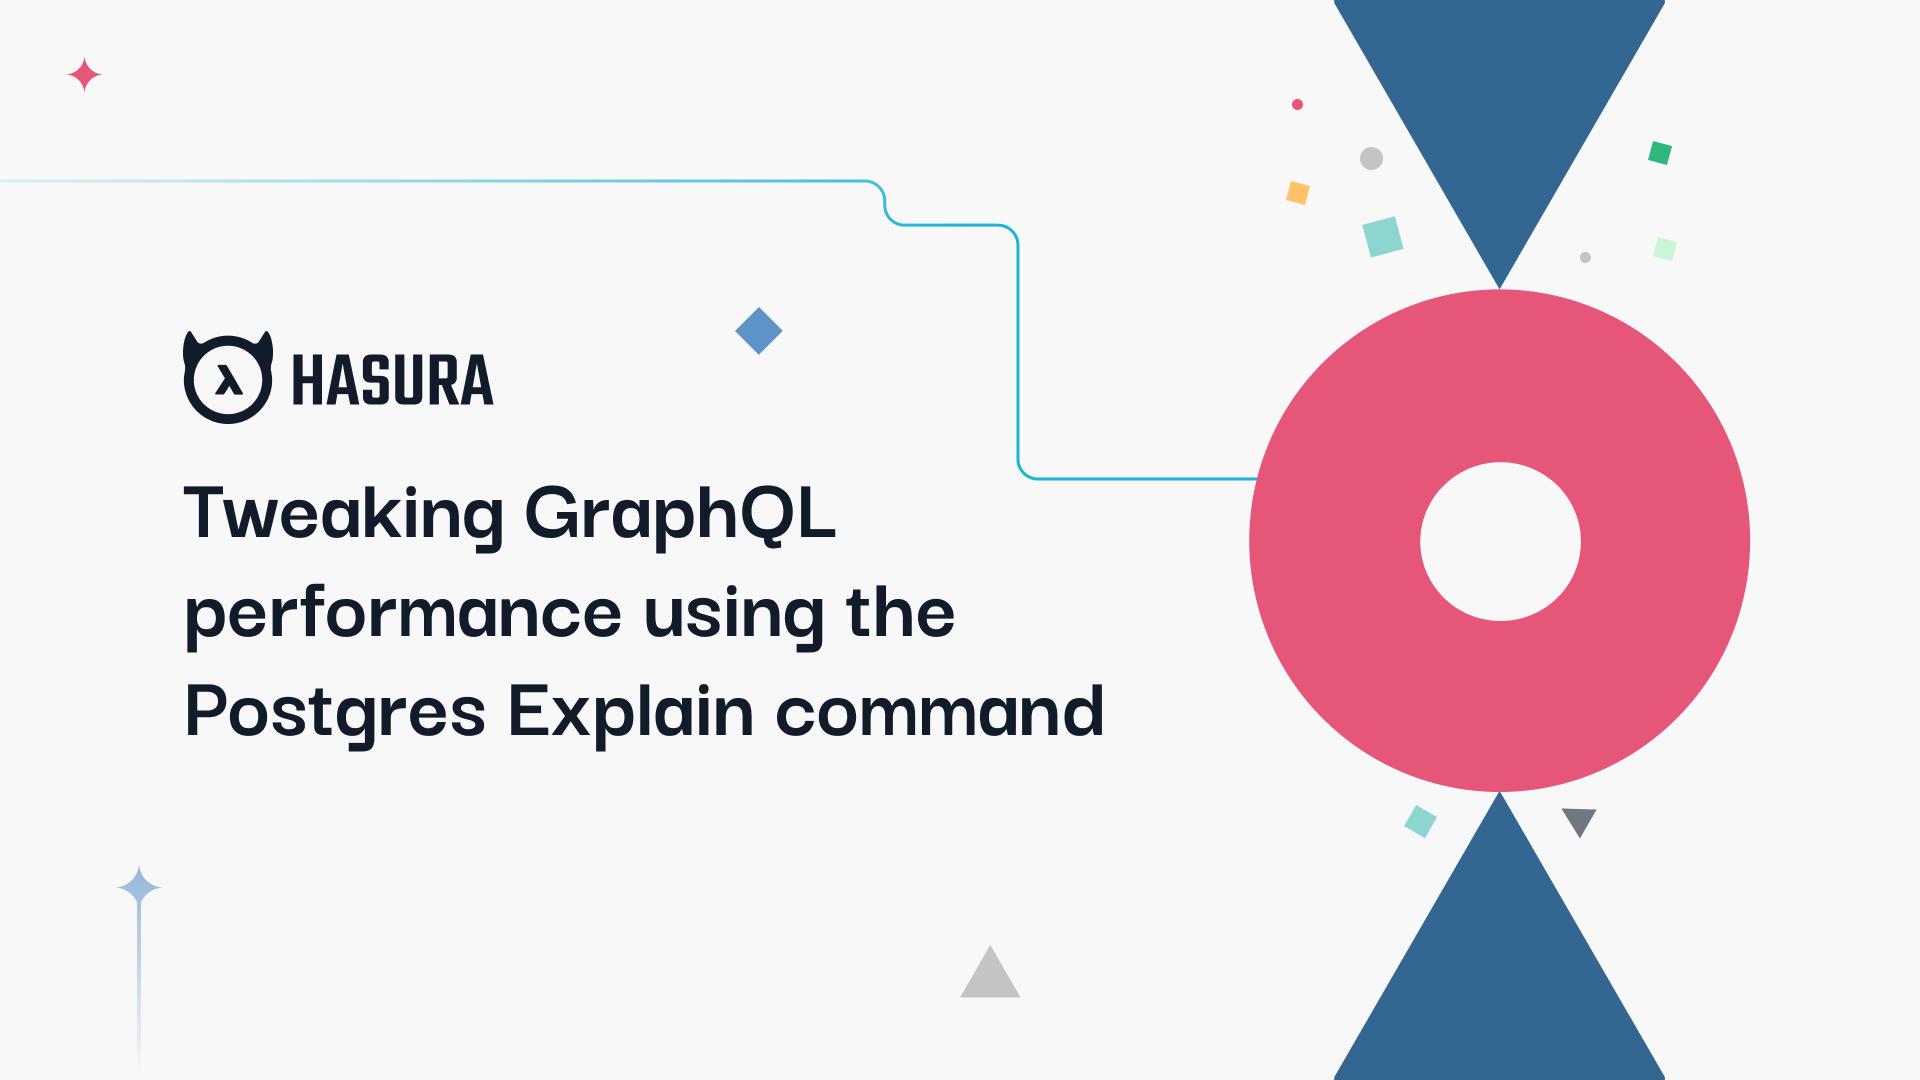 Tweaking GraphQL performance using Postgres' Explain command